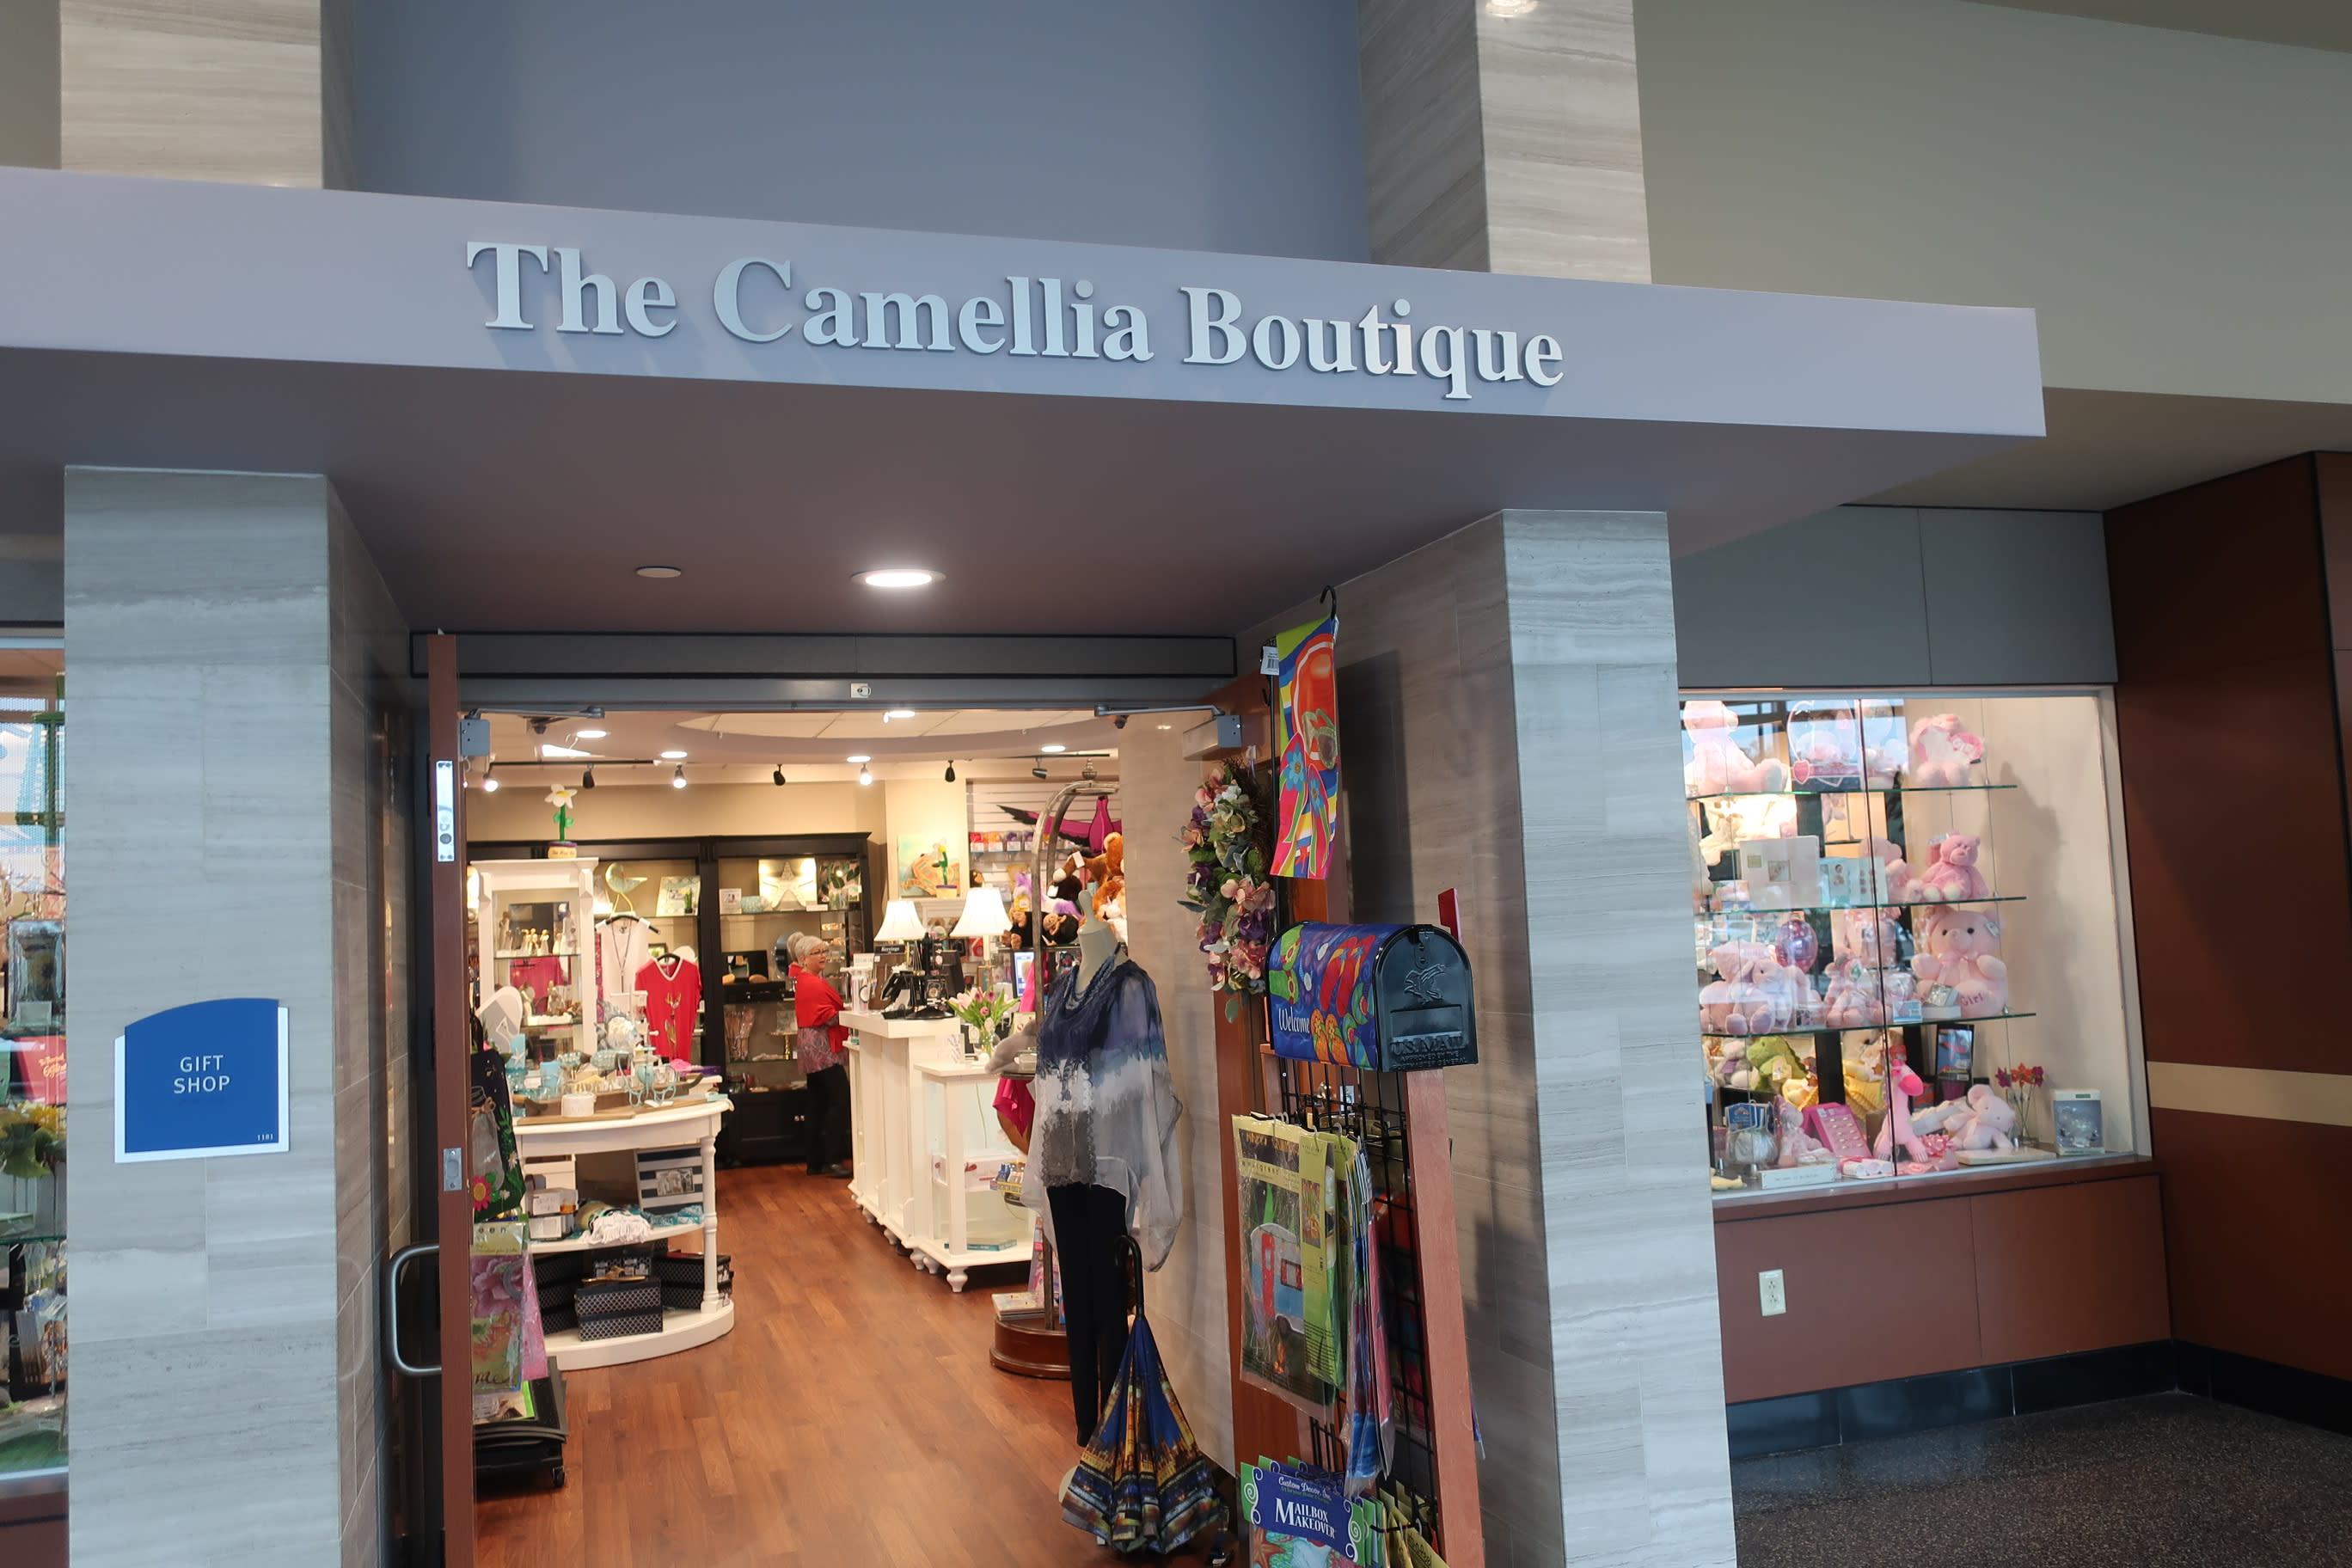 Camellia Boutique Gift Shop